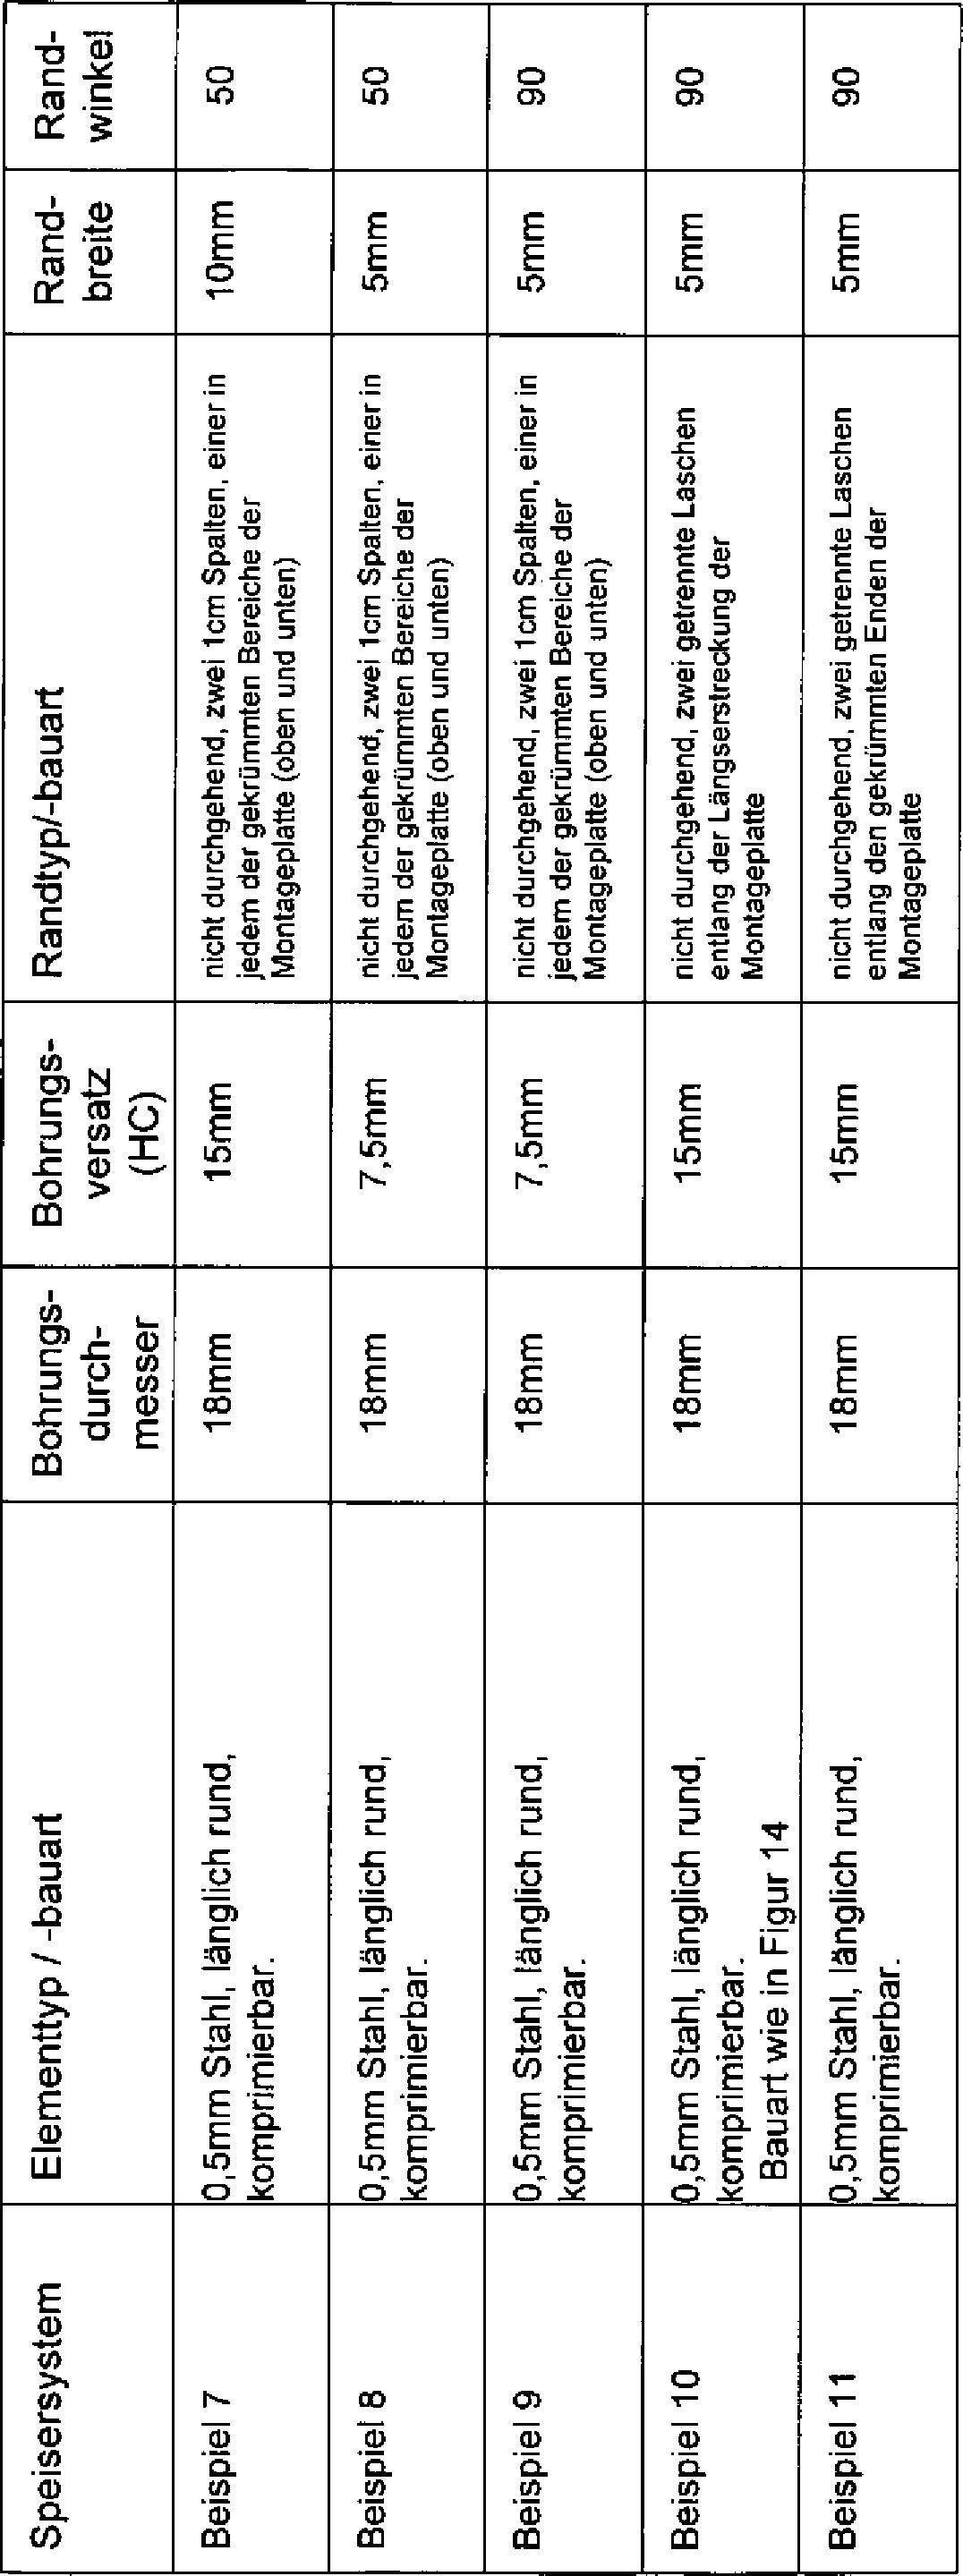 DE202011103718U1 - Speiserelement - Google Patents